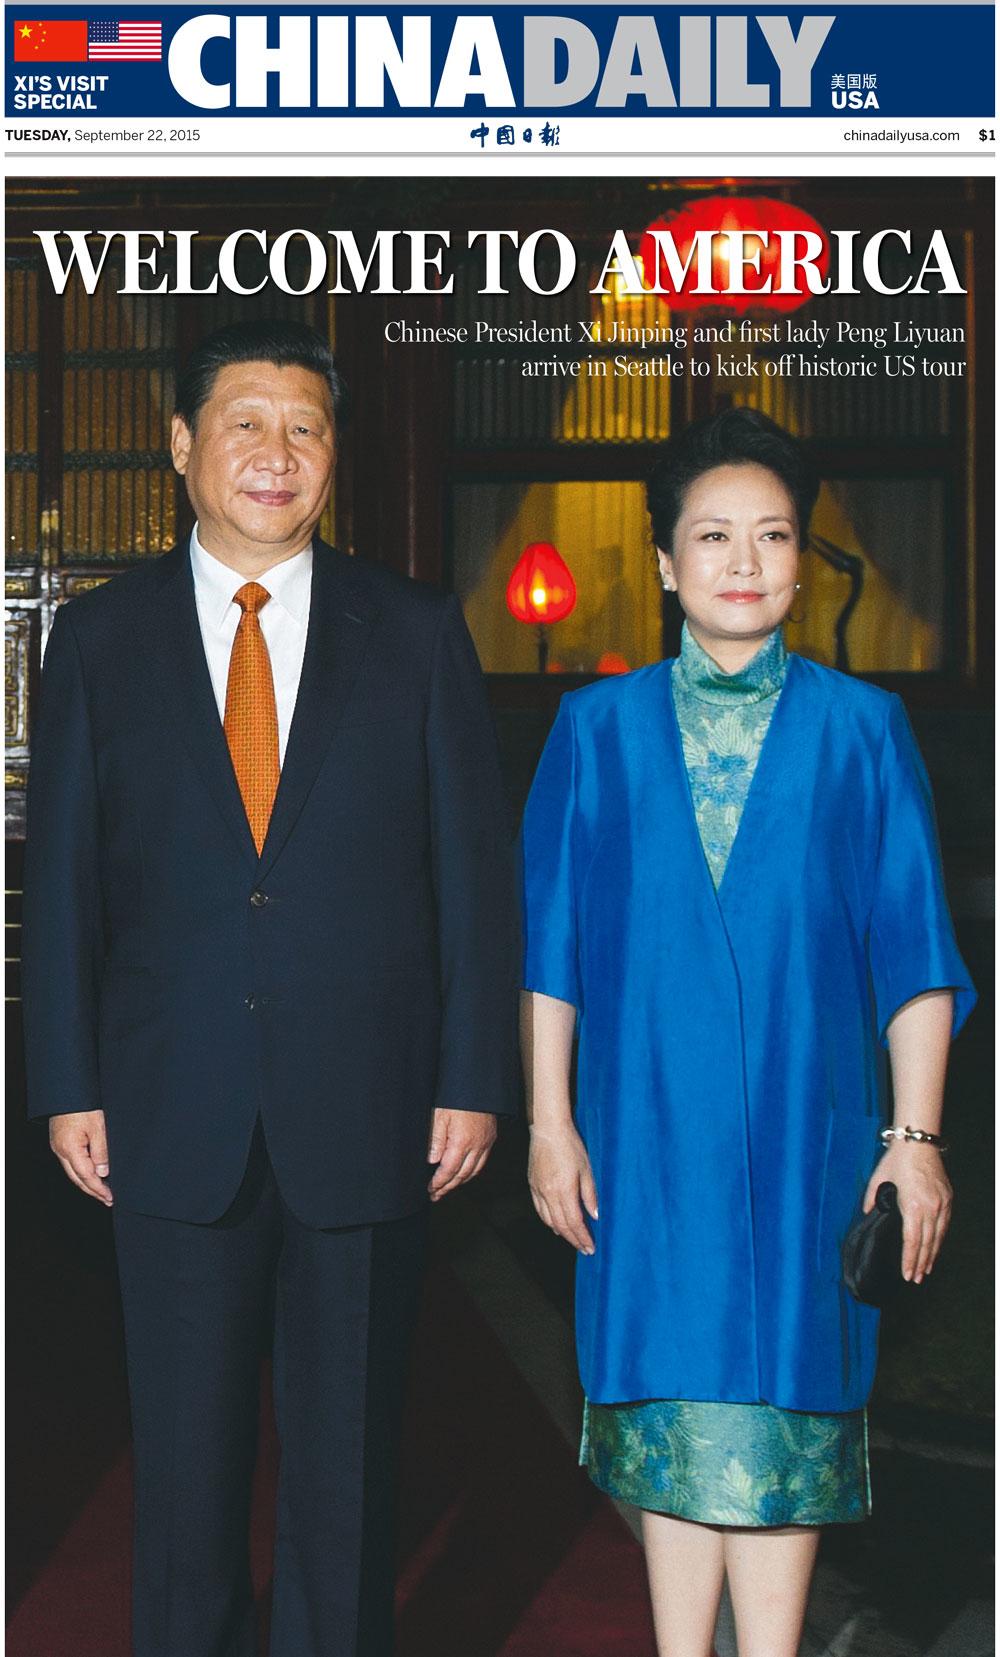 'China Daily,' U.S. edition, September 22, 2015.